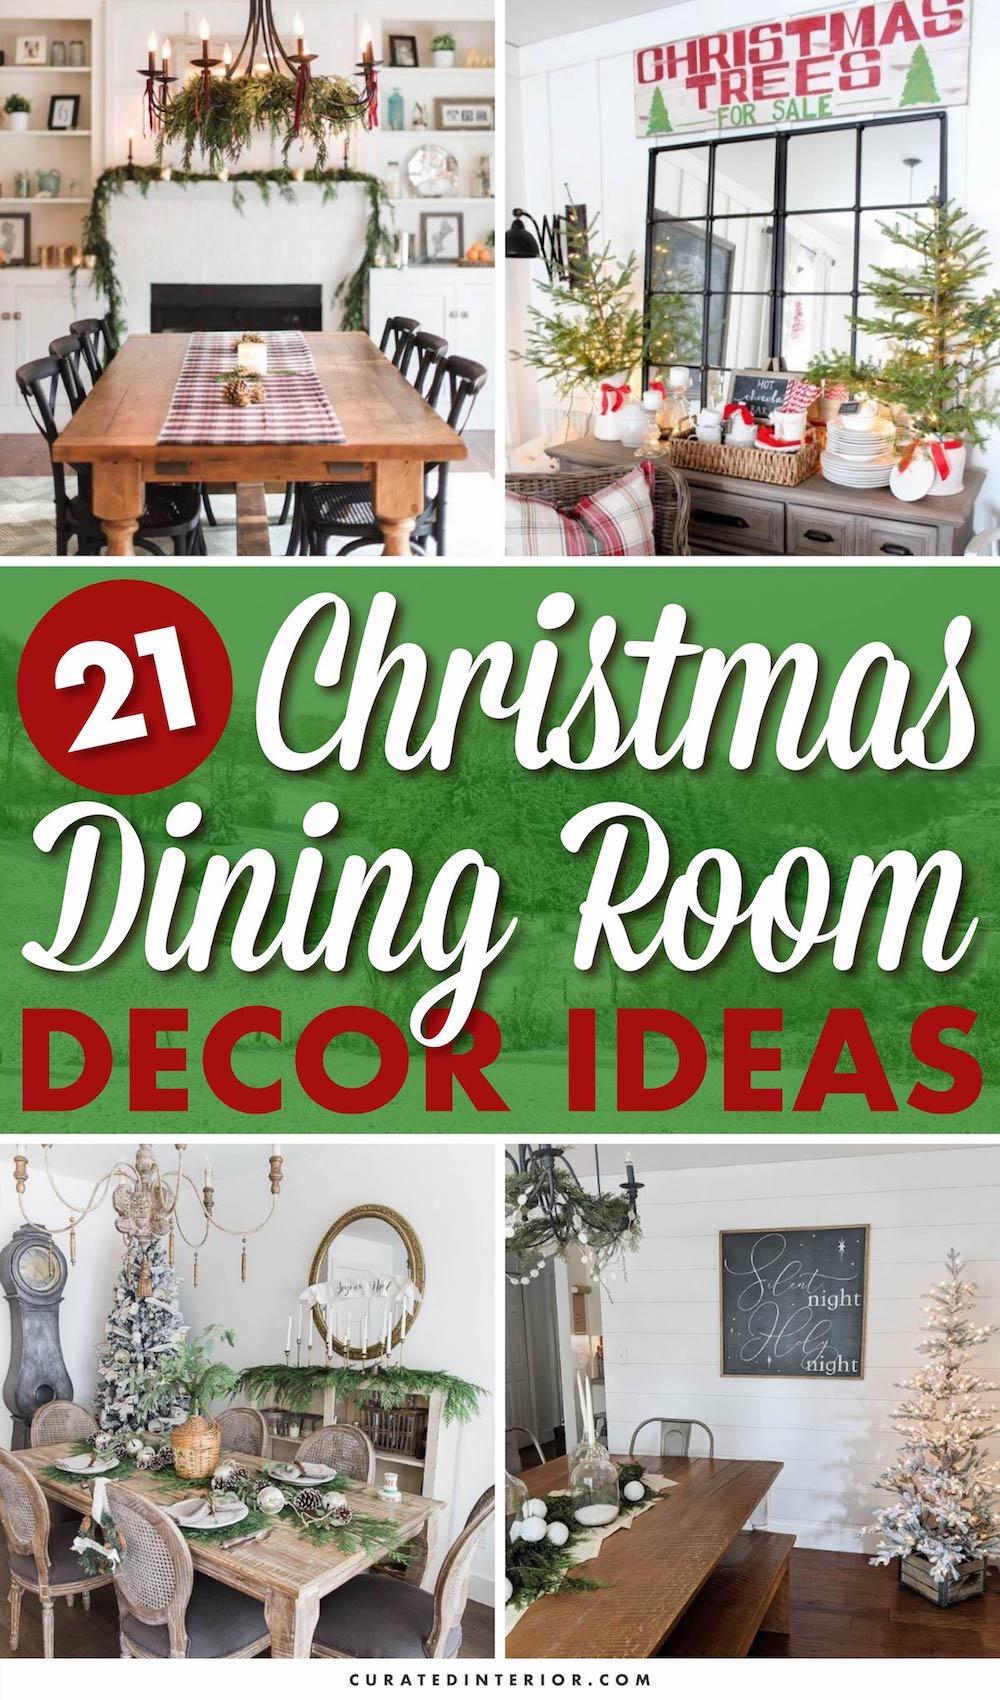 21 Christmas Dining Room Decor ideas #ChristmasDecor #ChristmasDiningRoom